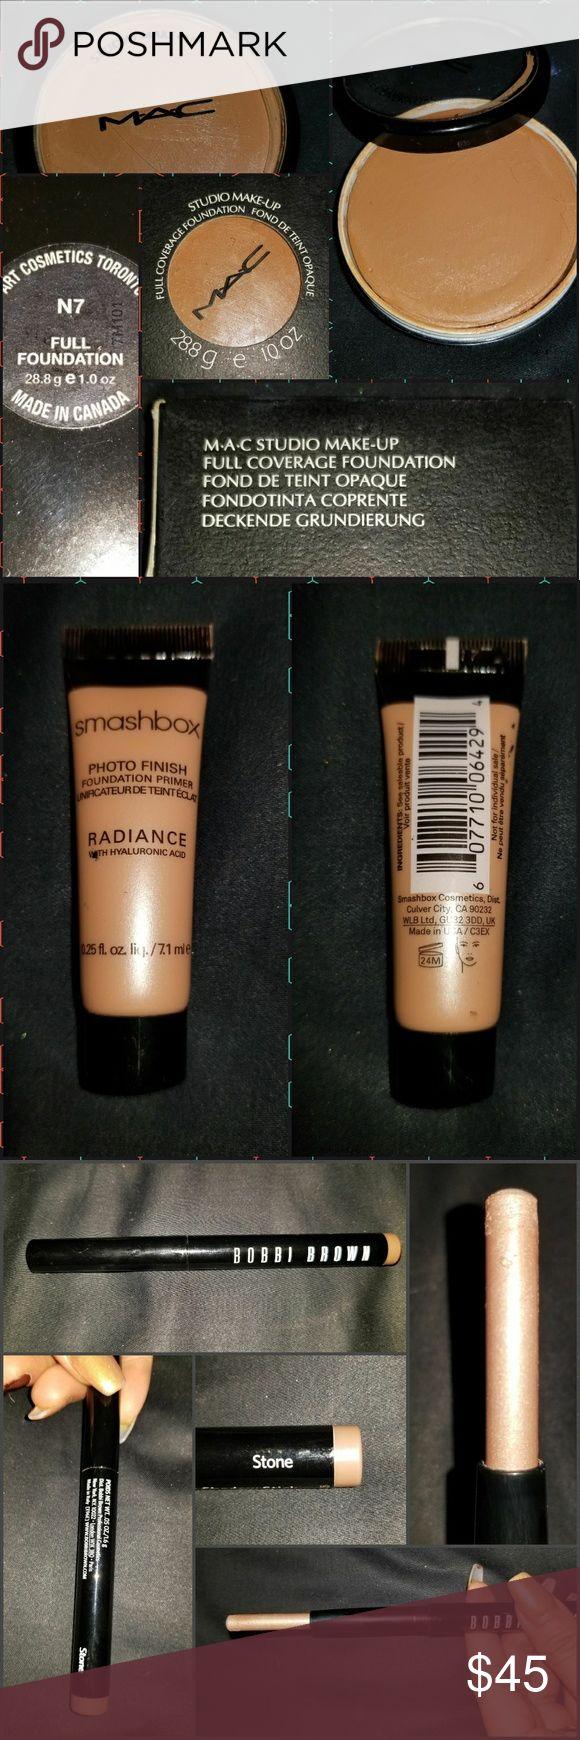 Best 25+ Mac cosmetics sale ideas on Pinterest | Mac cosmetics ...